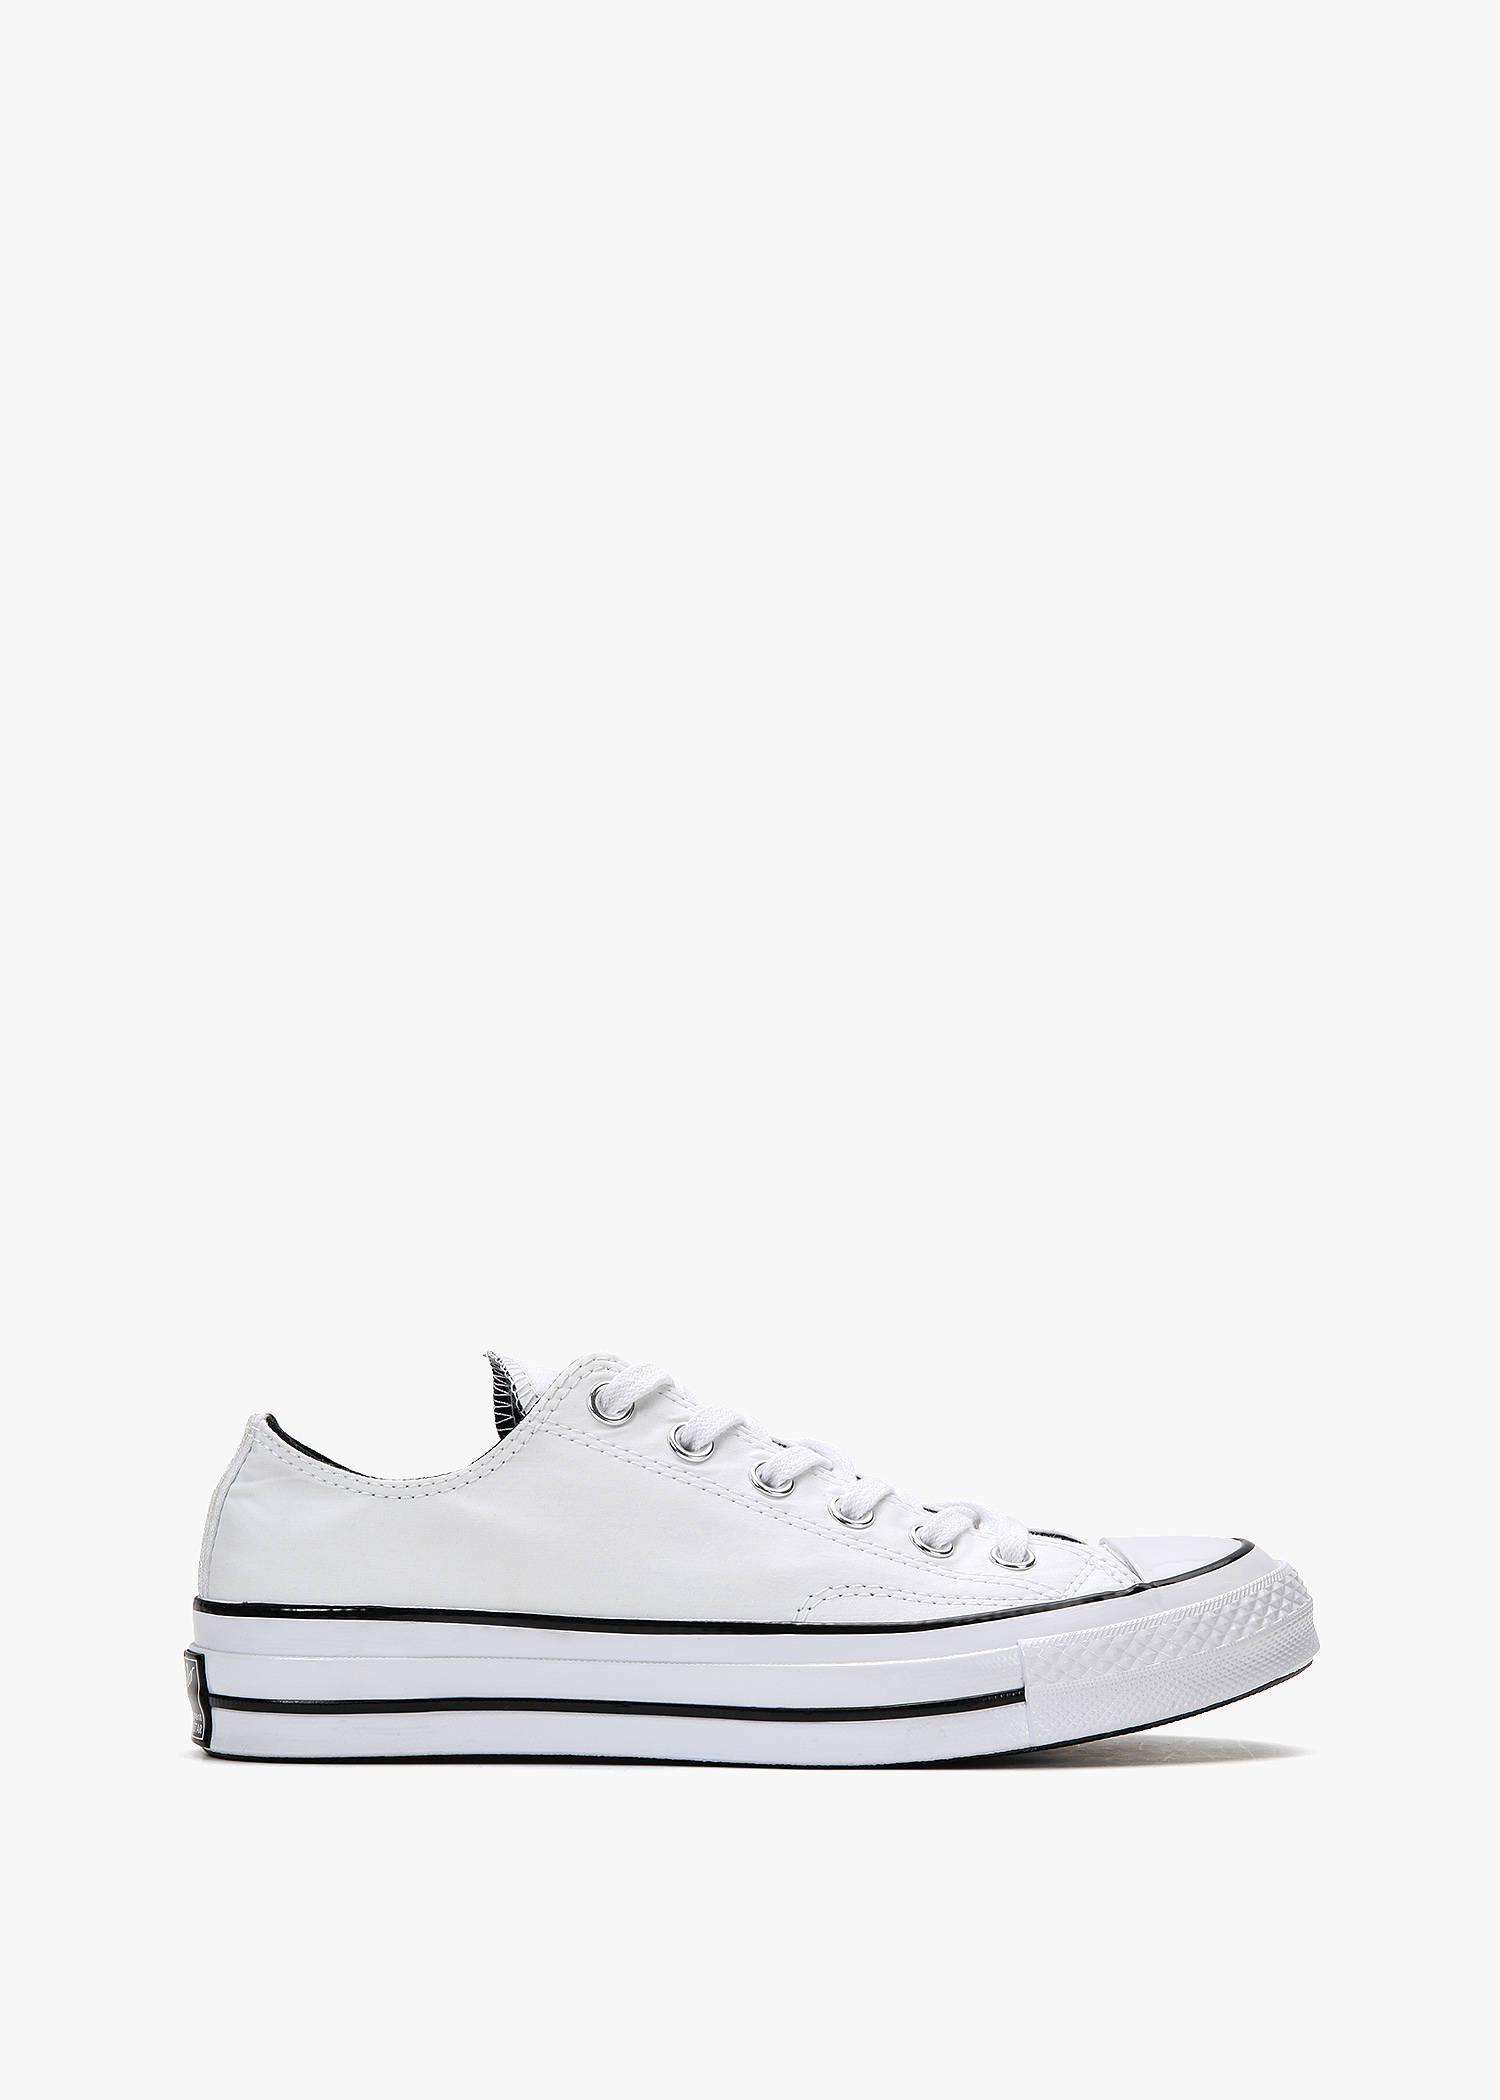 "Converse Fragment Design Ct70 ""Tuxedo Pack"" In White"